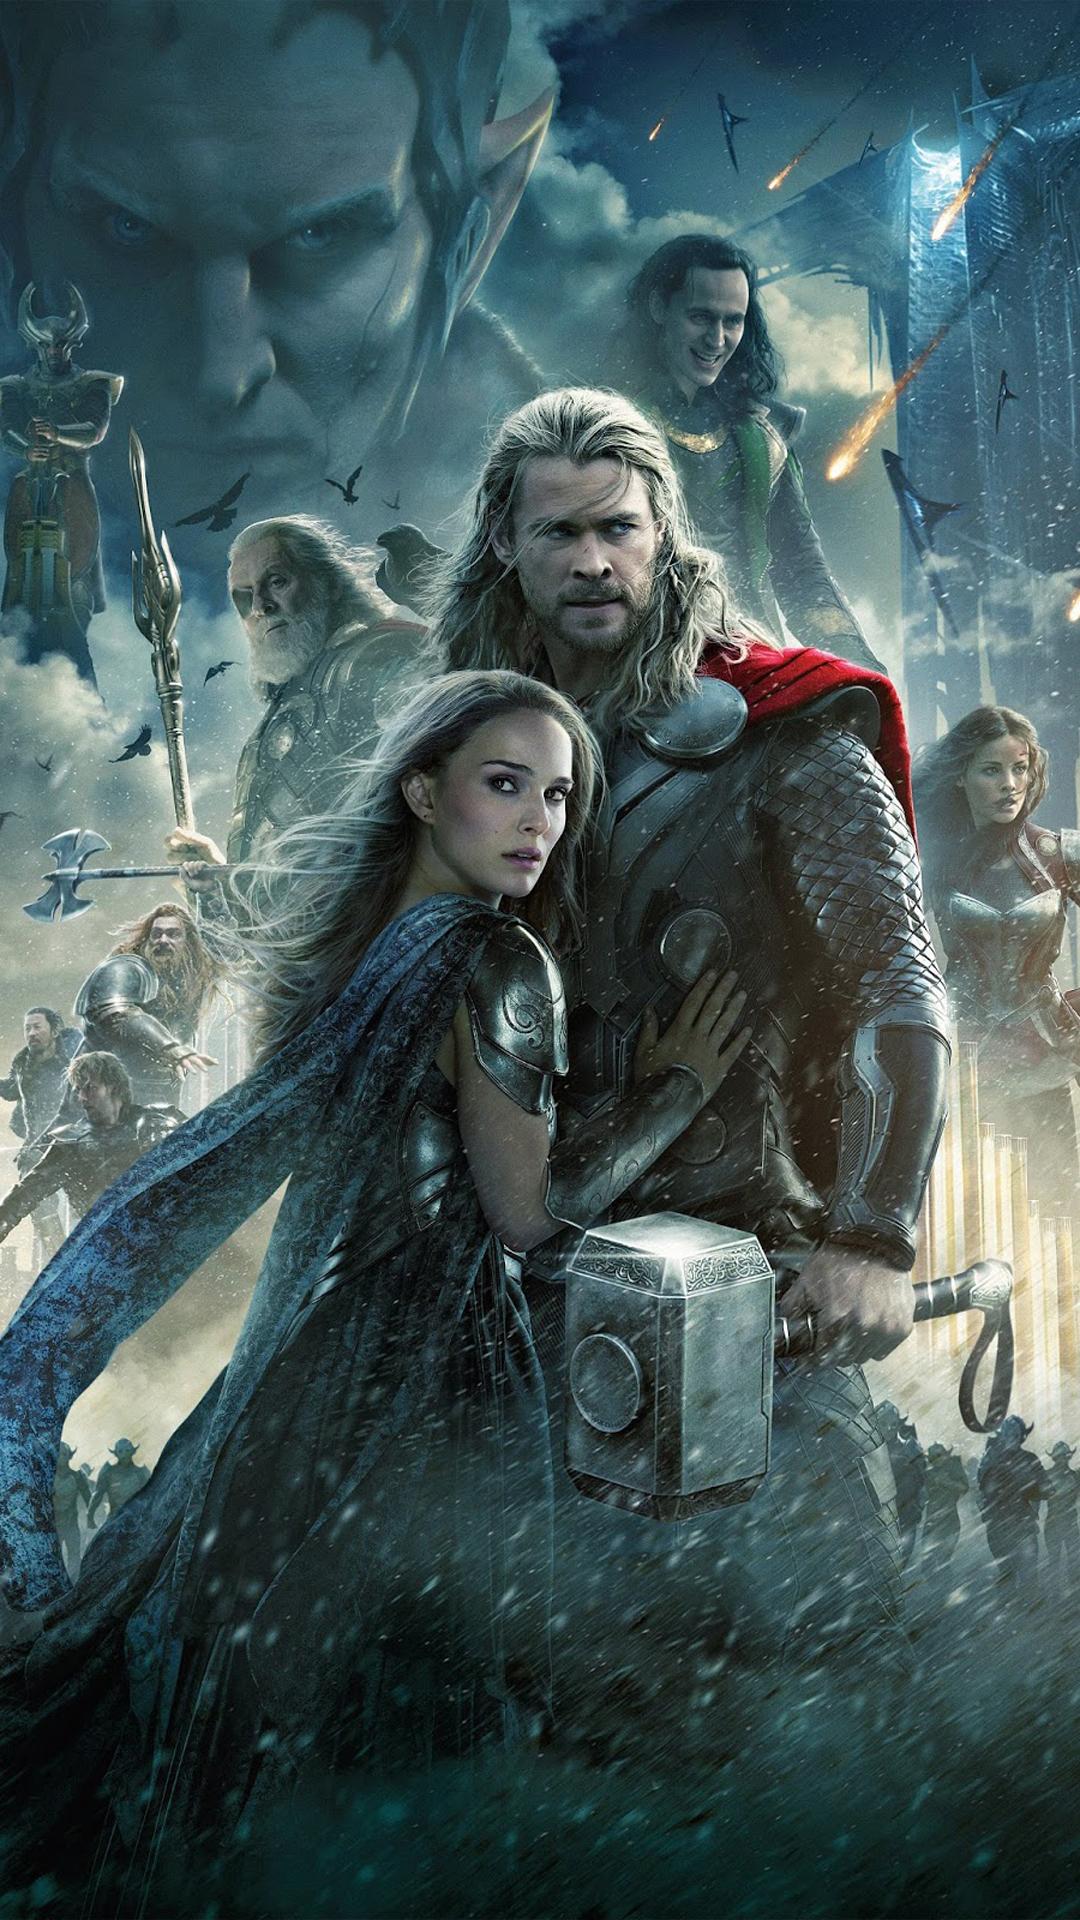 Thor The Dark World HTC hd wallpaper